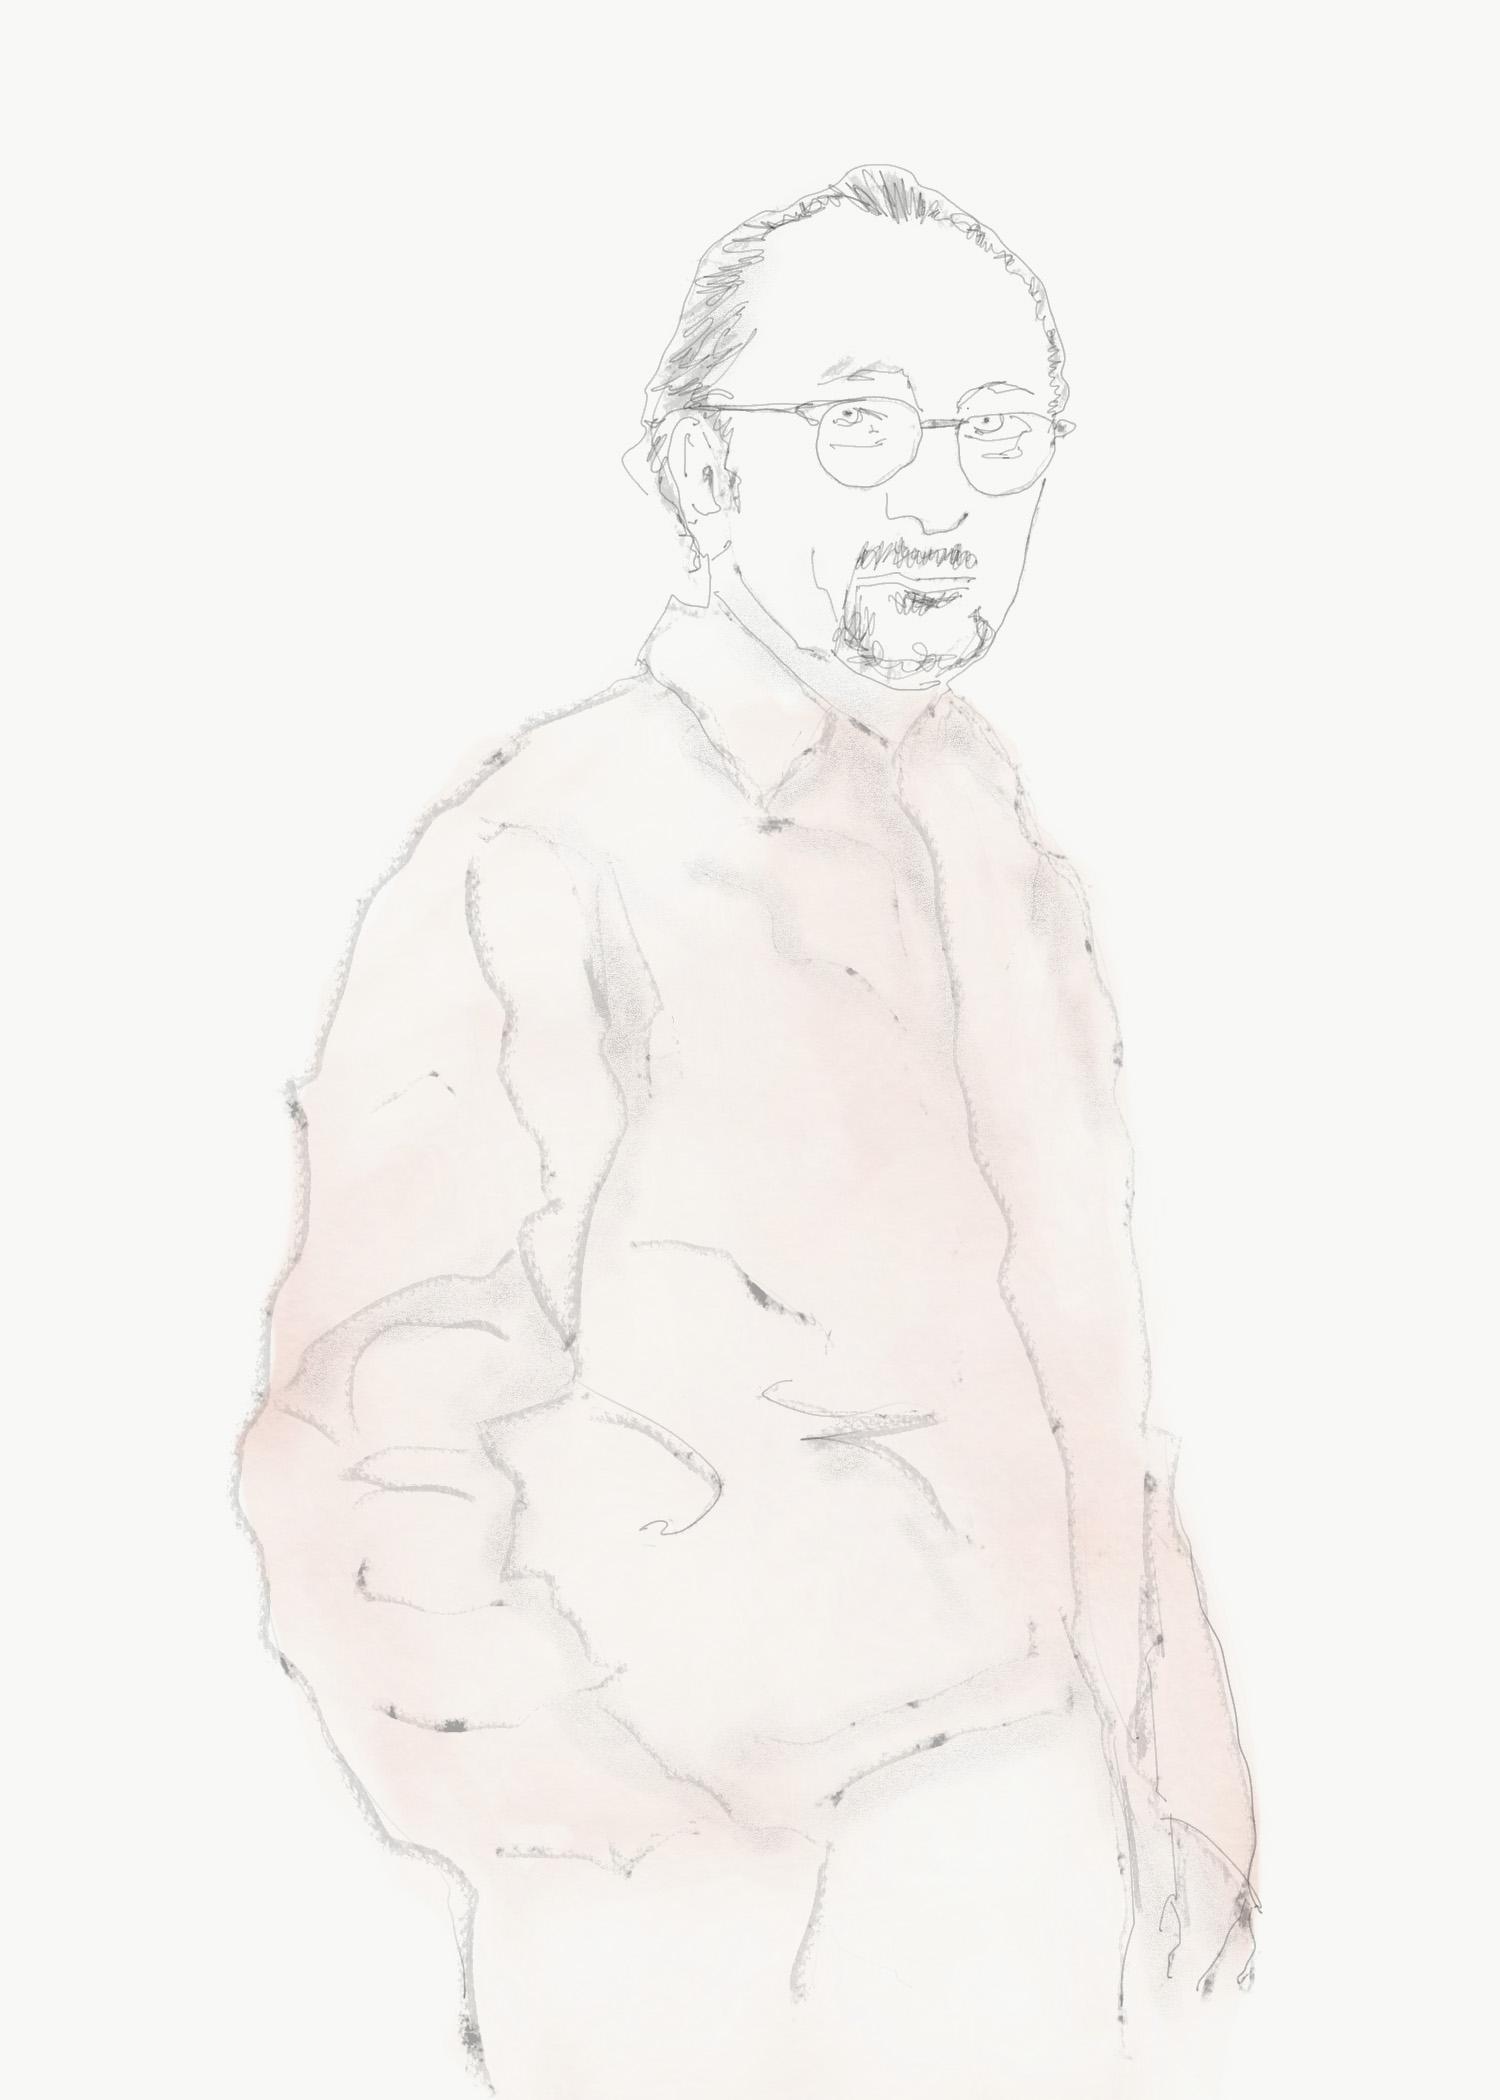 3_Chhandak Pradhan-illustration-unfinished sketch-portrait.jpg